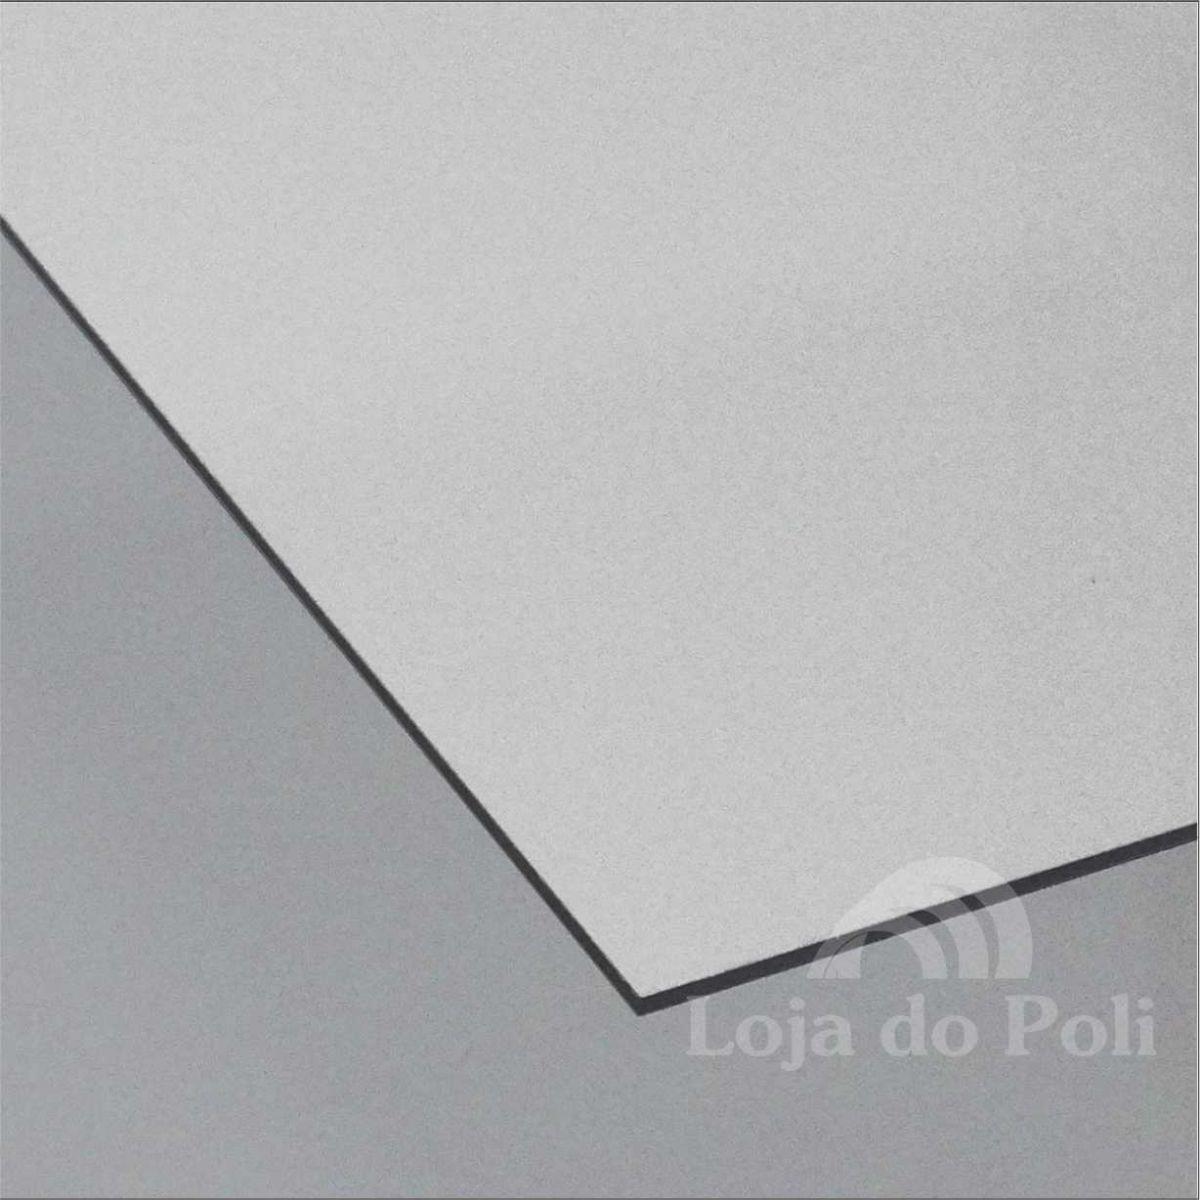 Chapa policarbonato compacto cristal incolor 6mm 1 0x2 0m - Cristal policarbonato ...